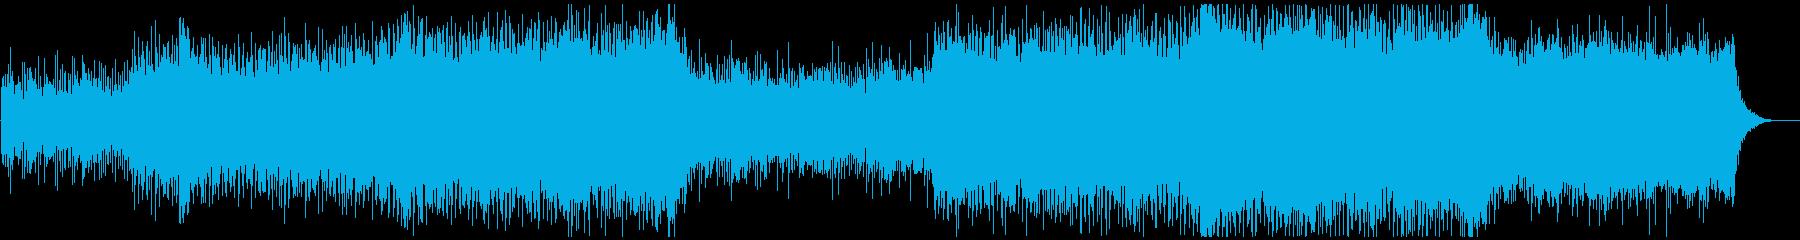 Serious Technoの再生済みの波形